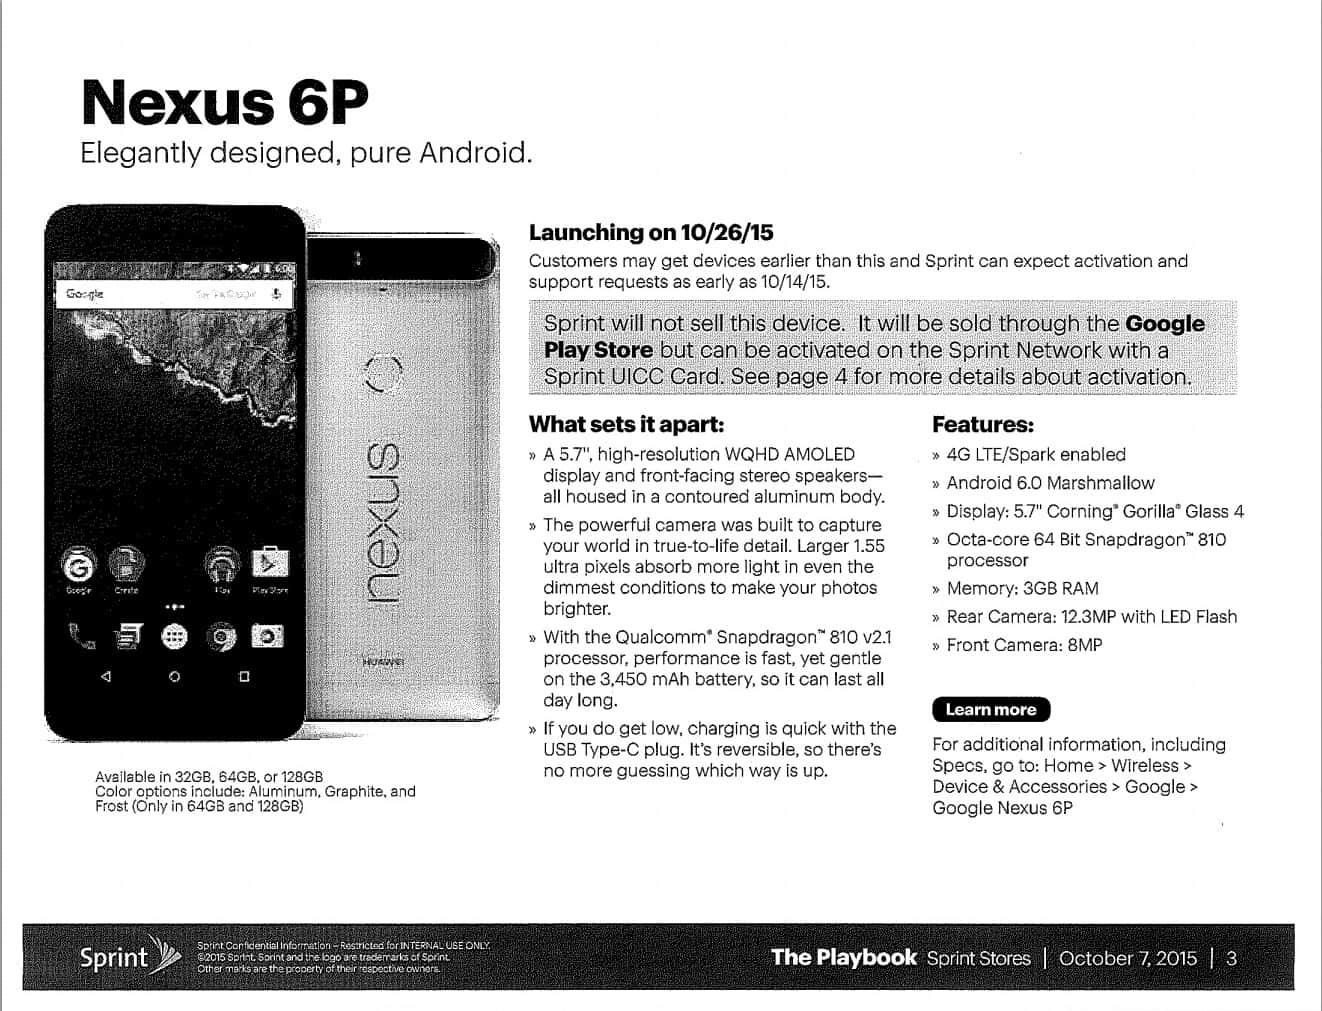 Nexus 6P Sprint availability leaked flyer_1